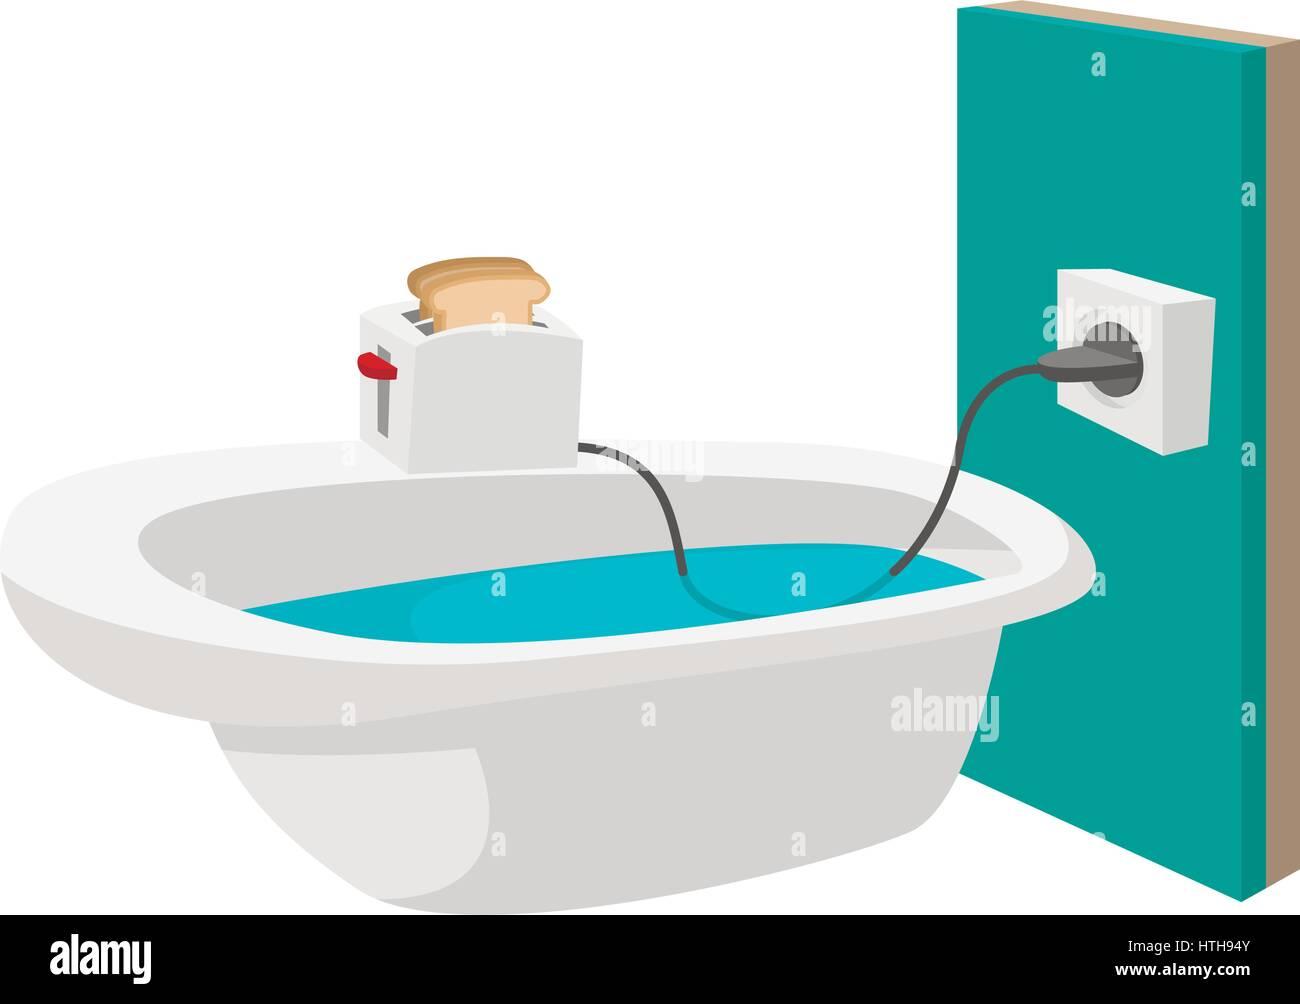 Toaster on the edge of a bathtub icon Stock Vector Art ...